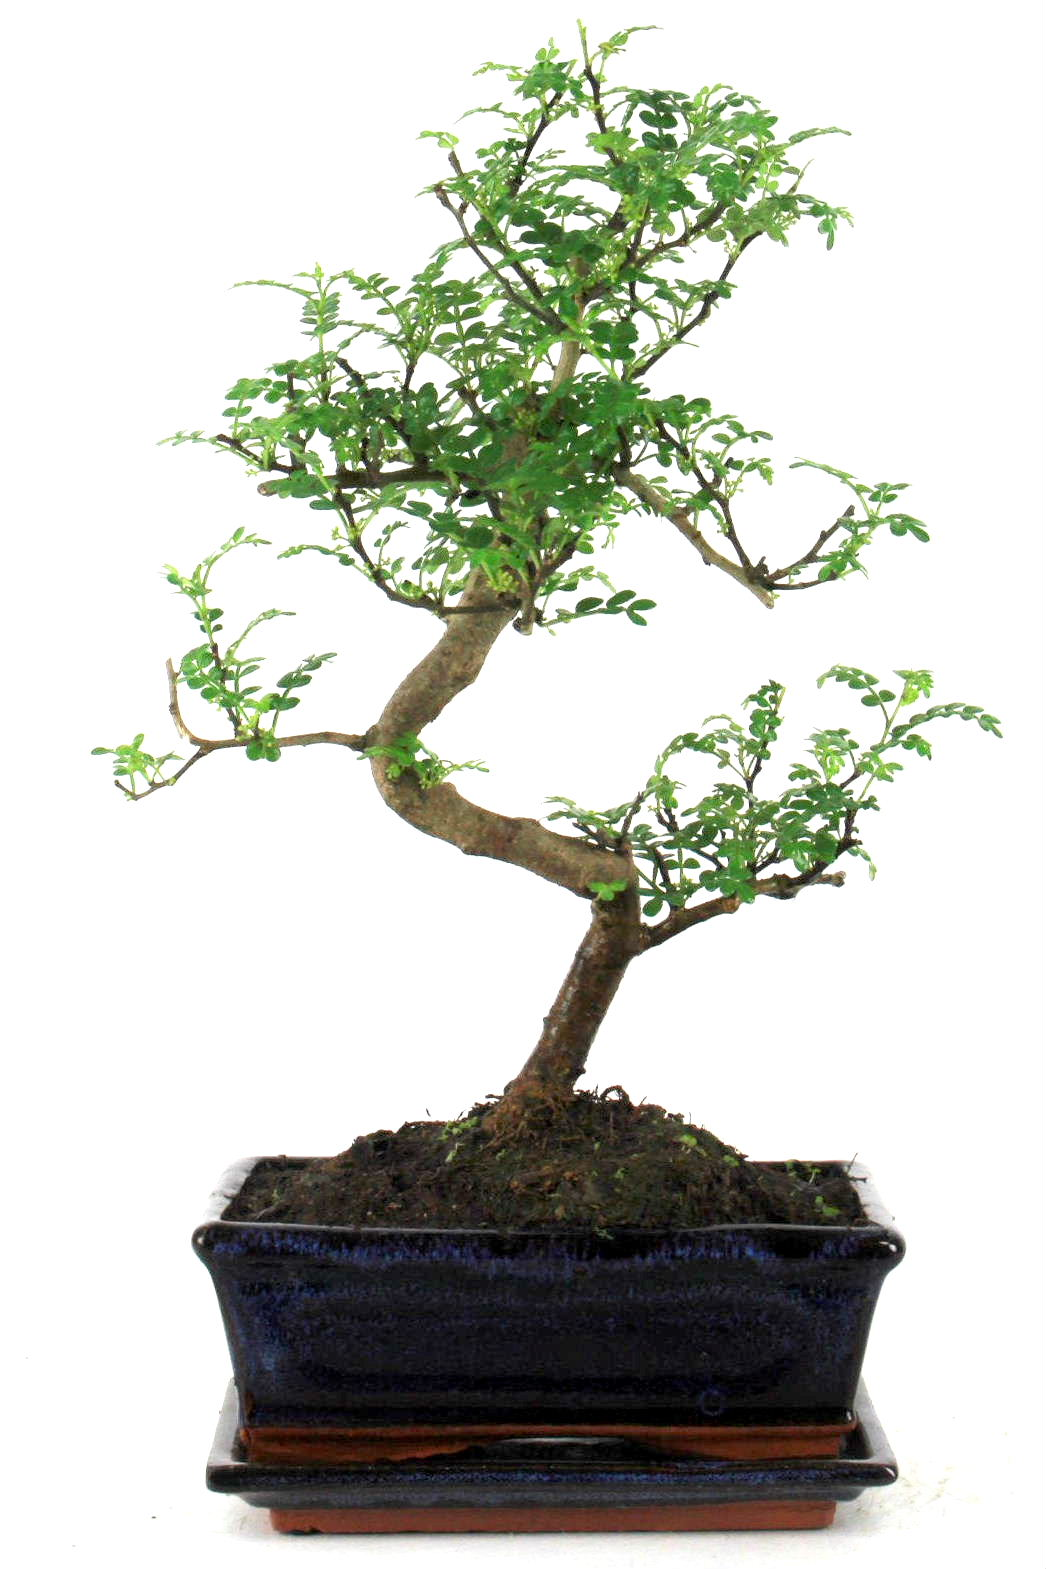 szechuan pfeffer 40 cm 189 bei oyaki bonsai kaufen. Black Bedroom Furniture Sets. Home Design Ideas